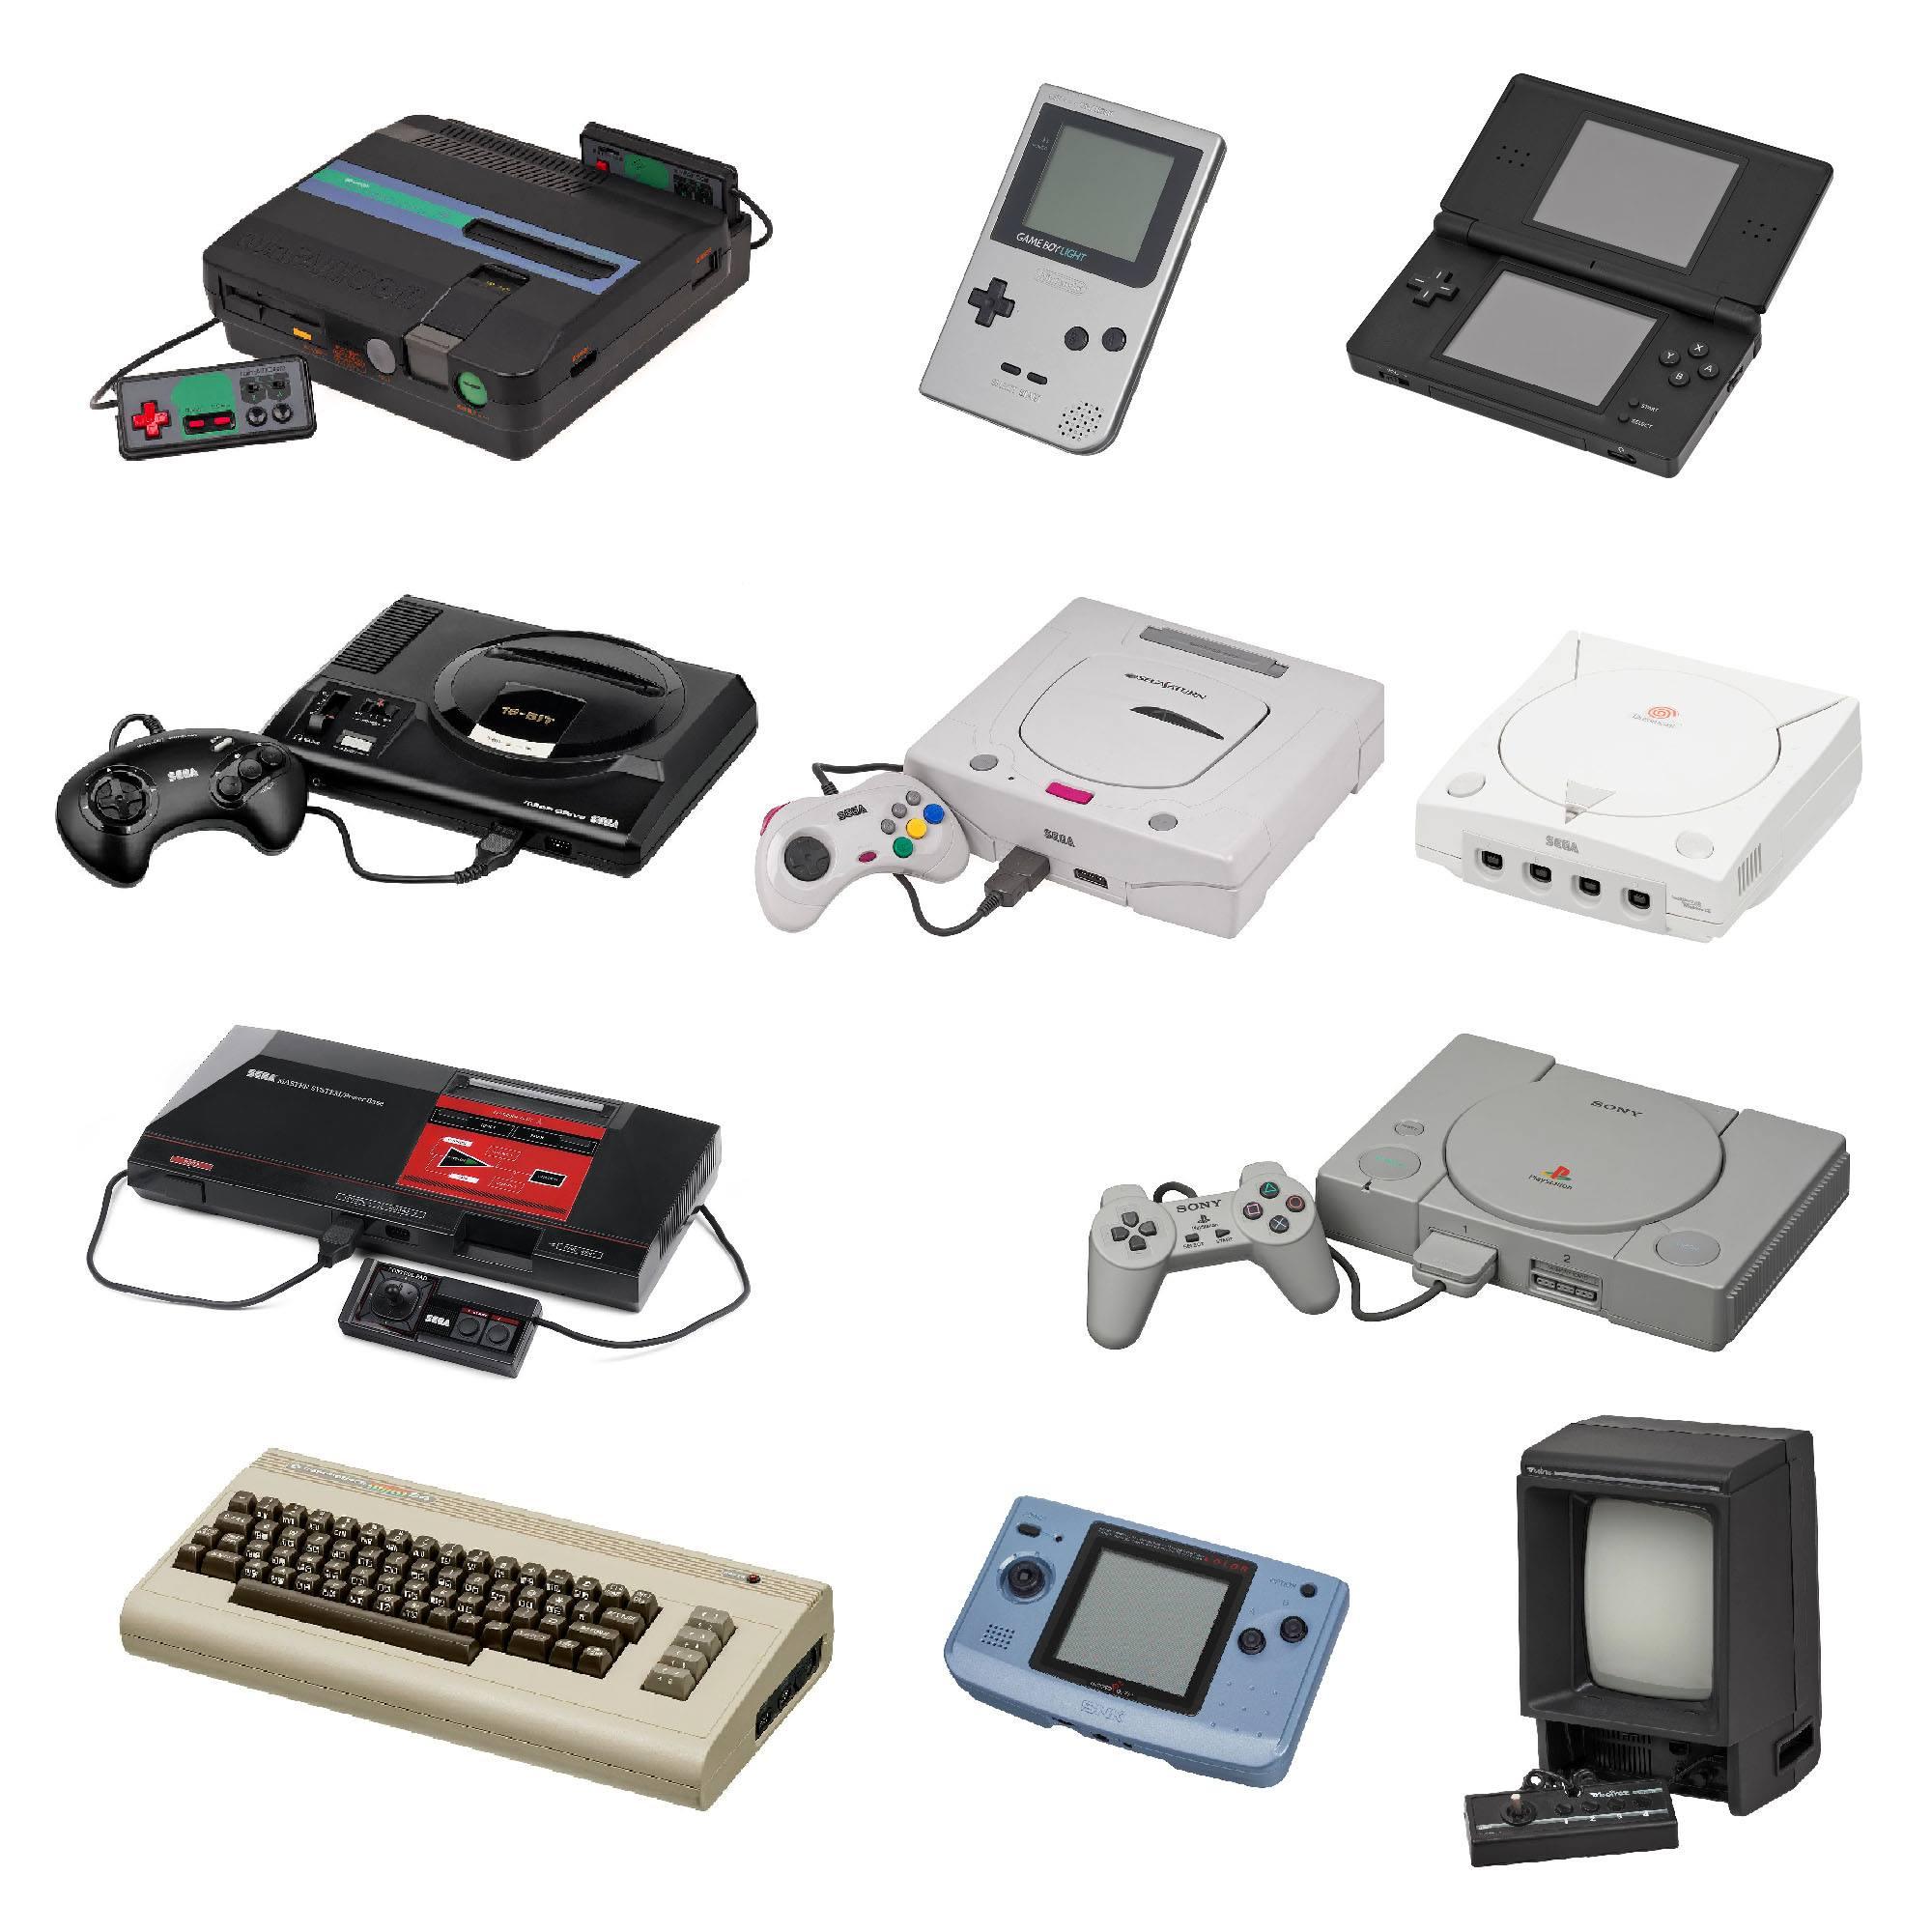 consoles.jpg